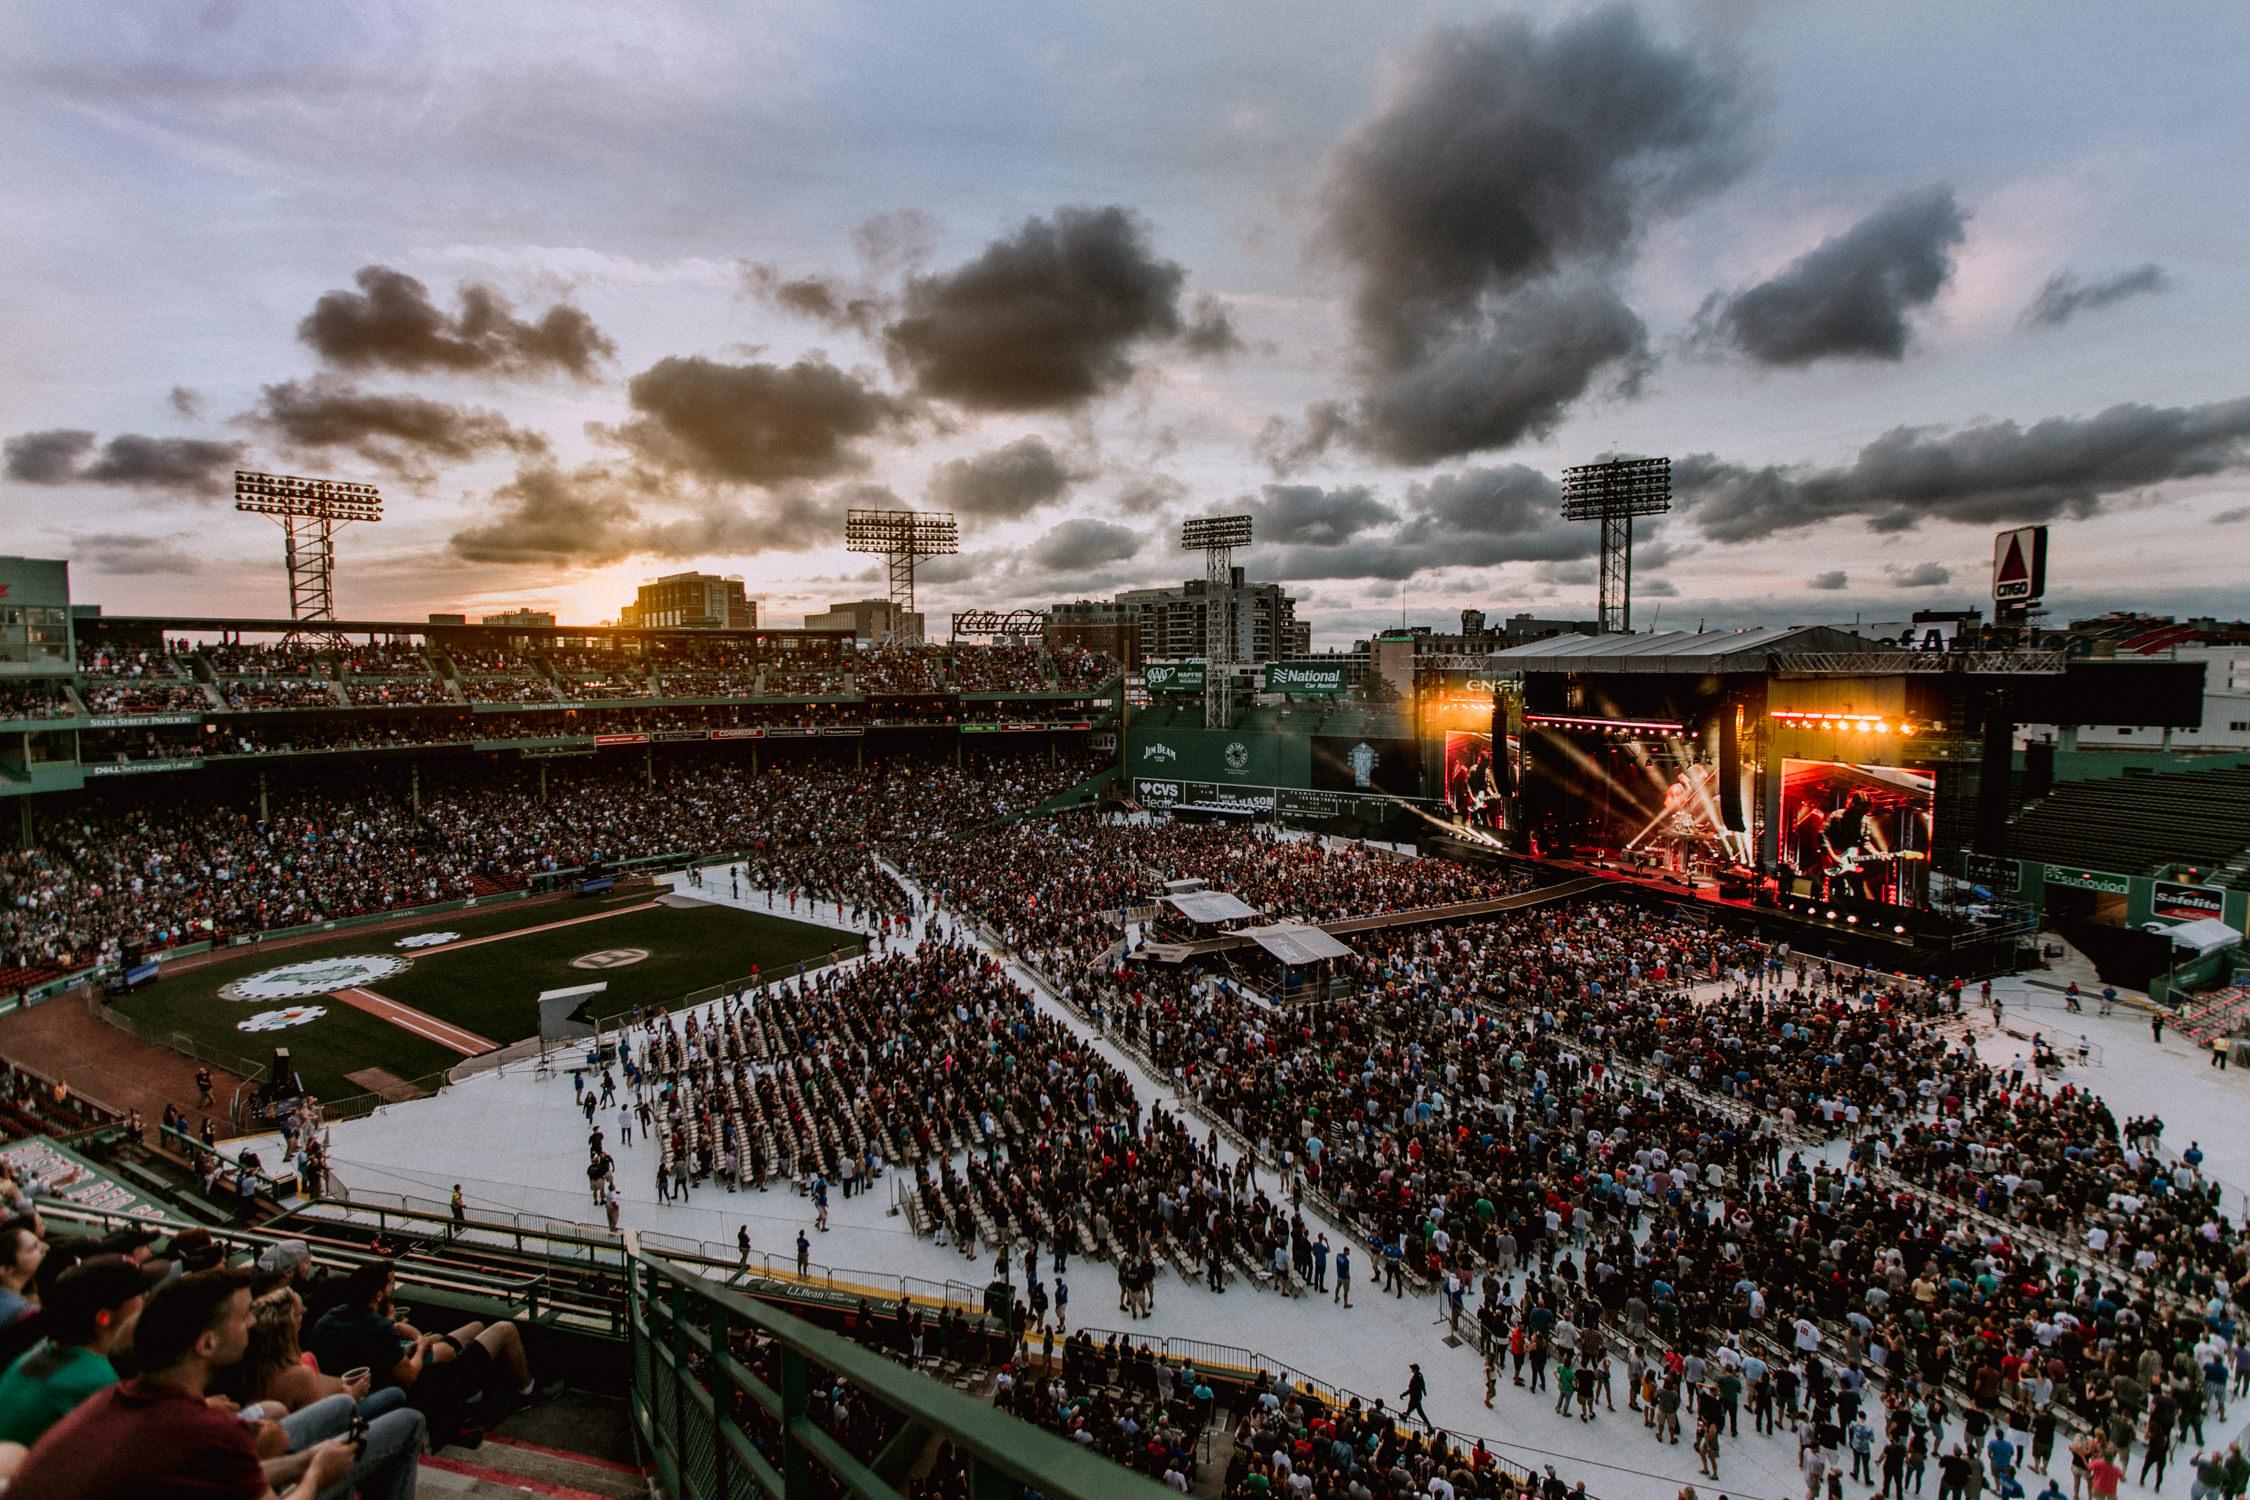 foo-fighters-fenway-park-live-stadium-show-AnnaLeeMedia